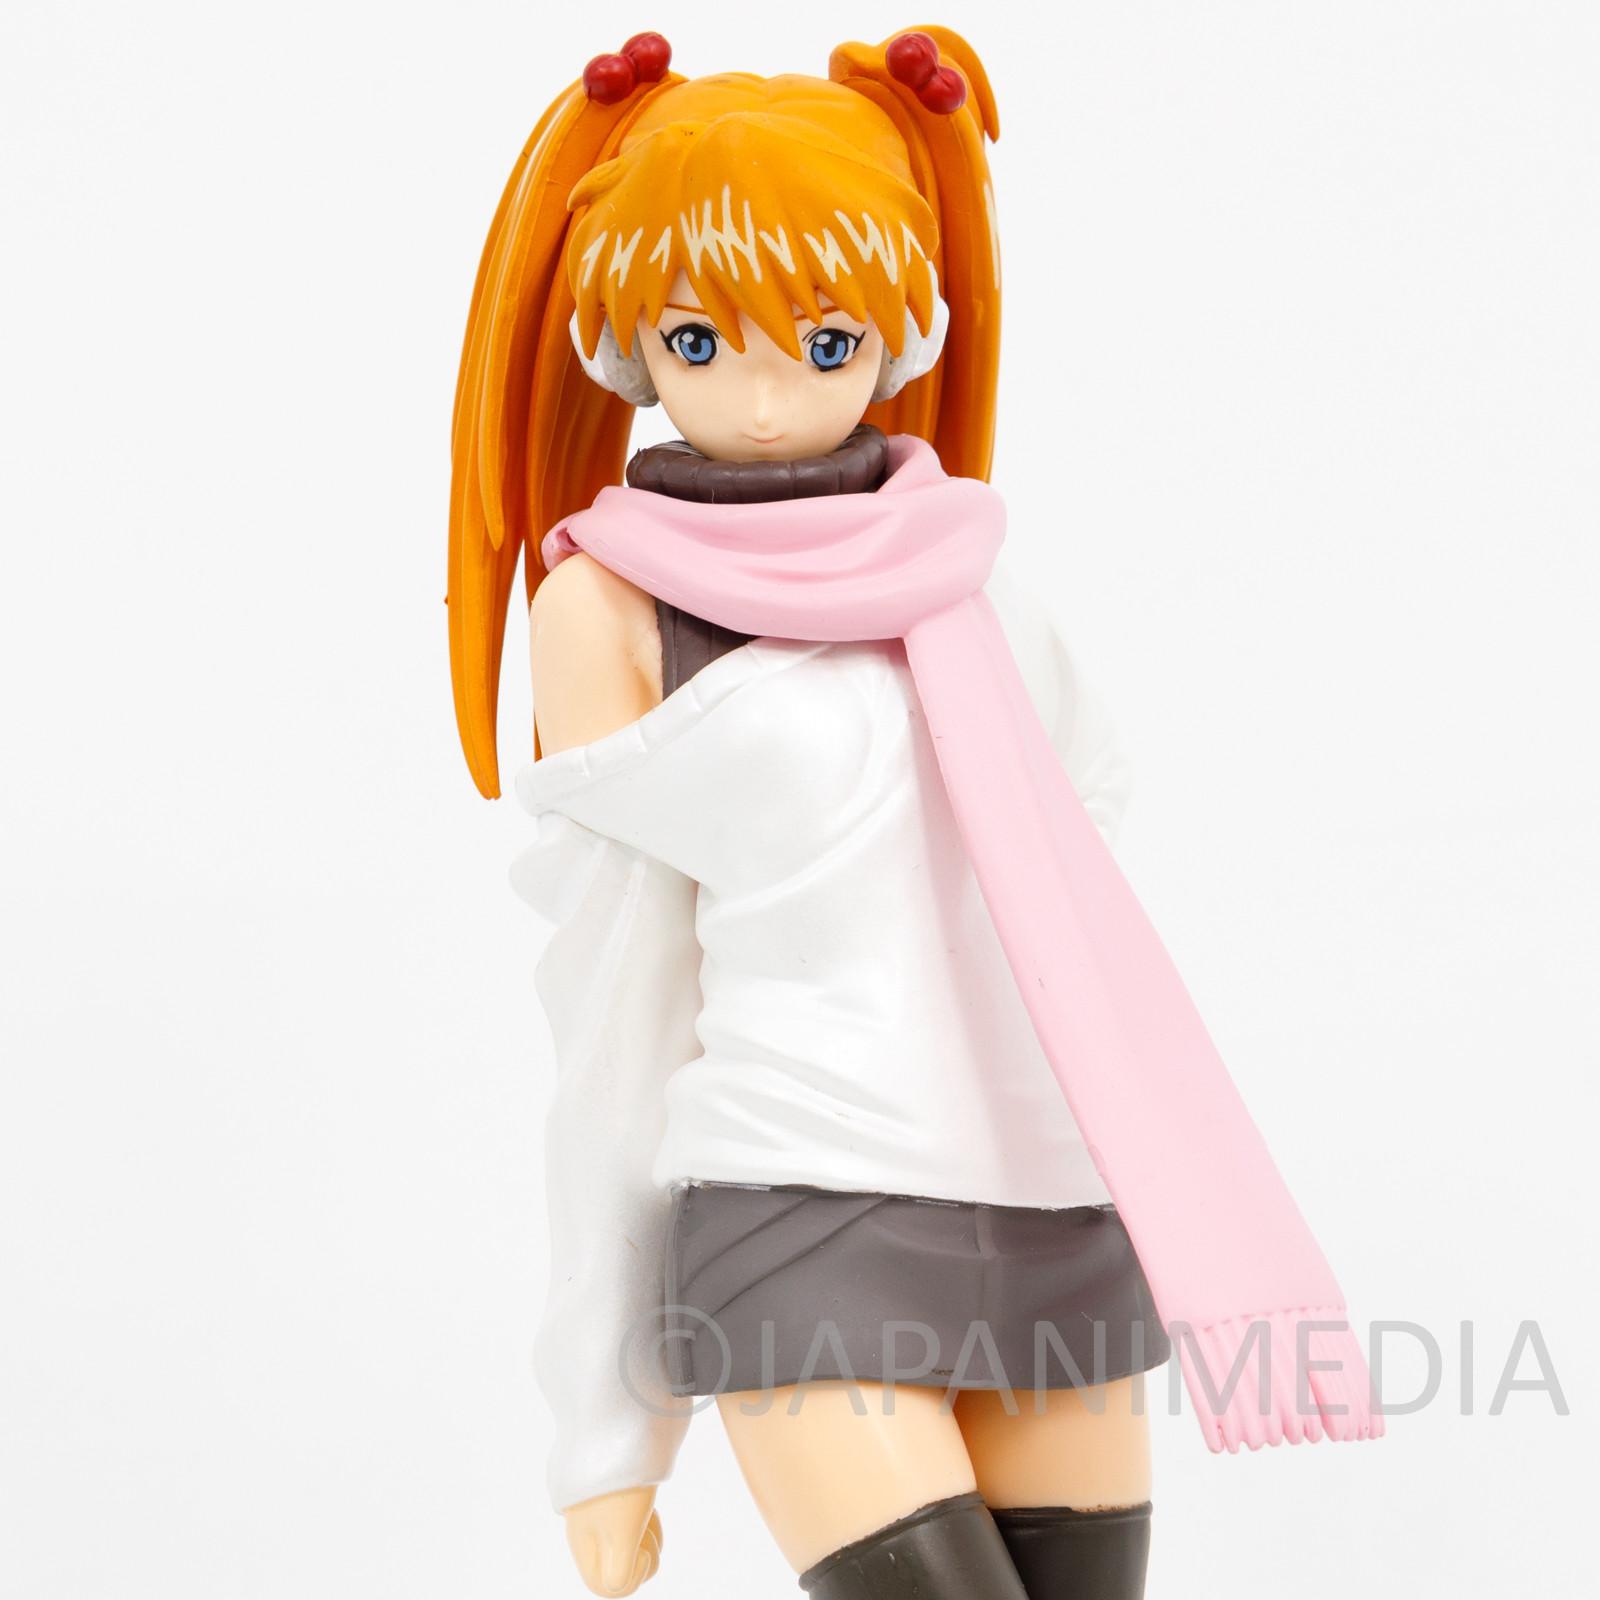 Evangelion Asuka Langley Casual Clothes Figure SEGA JAPAN ANIME MANGA